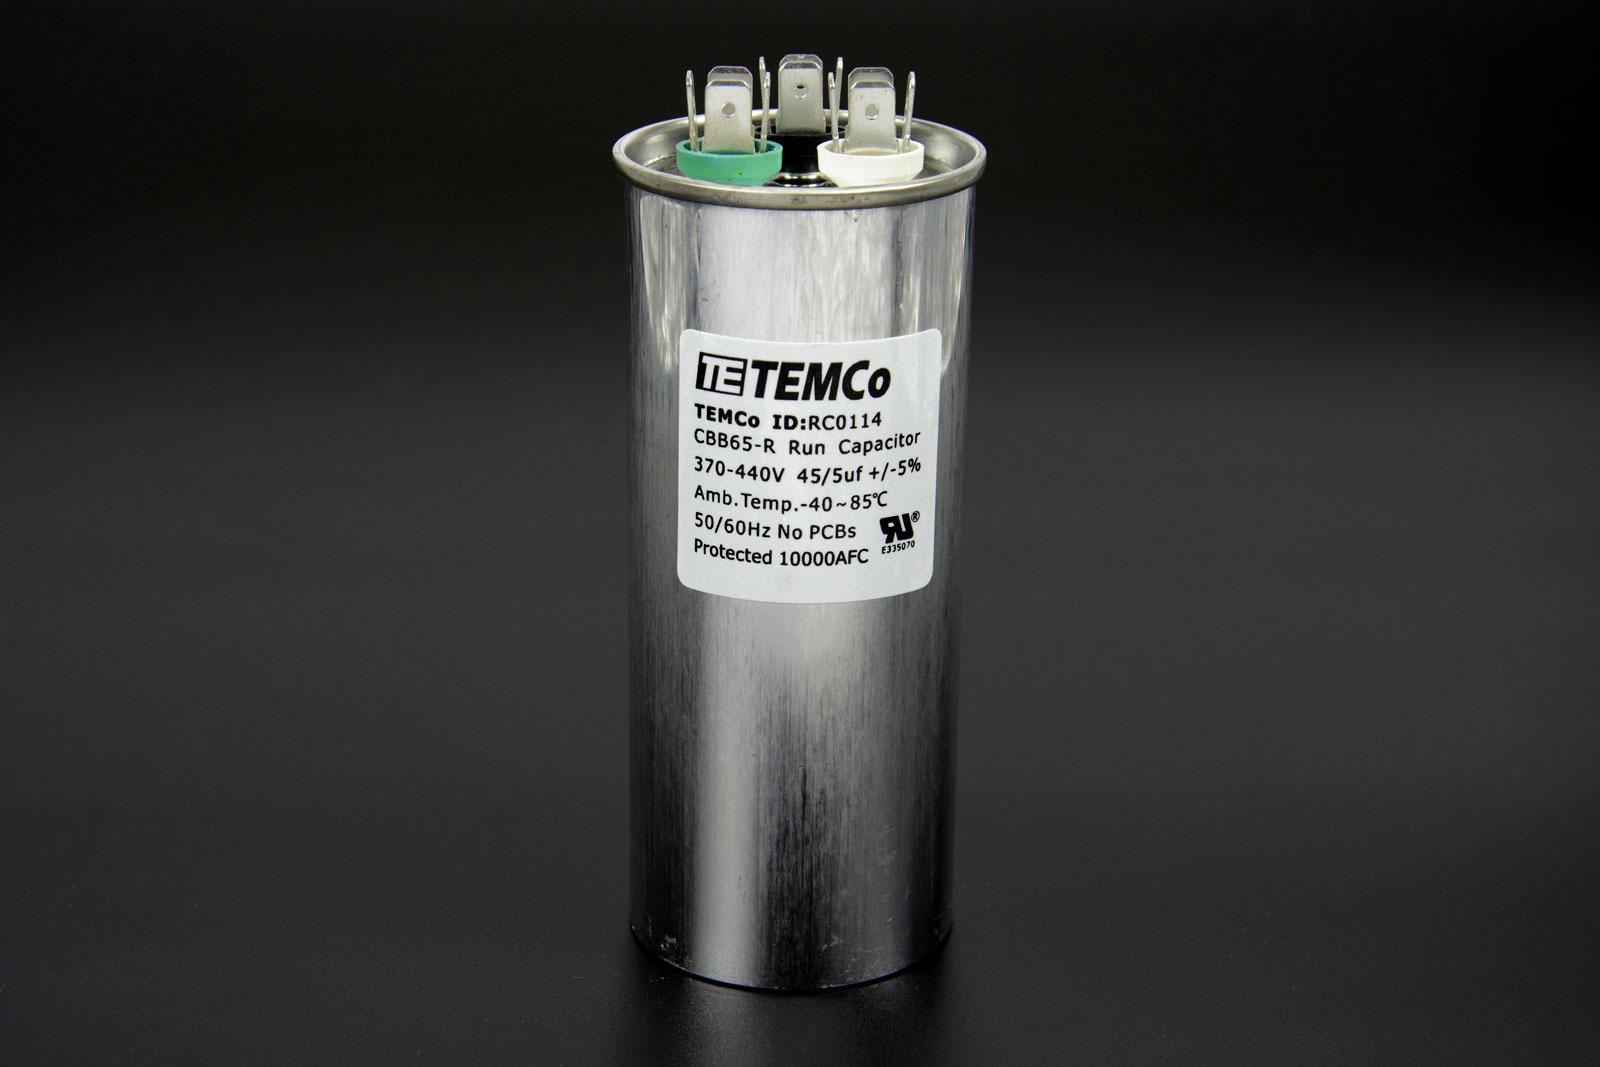 Temco 45 5 Mfd Uf Dual Run Capacitor 370 440 Vac Volts 5